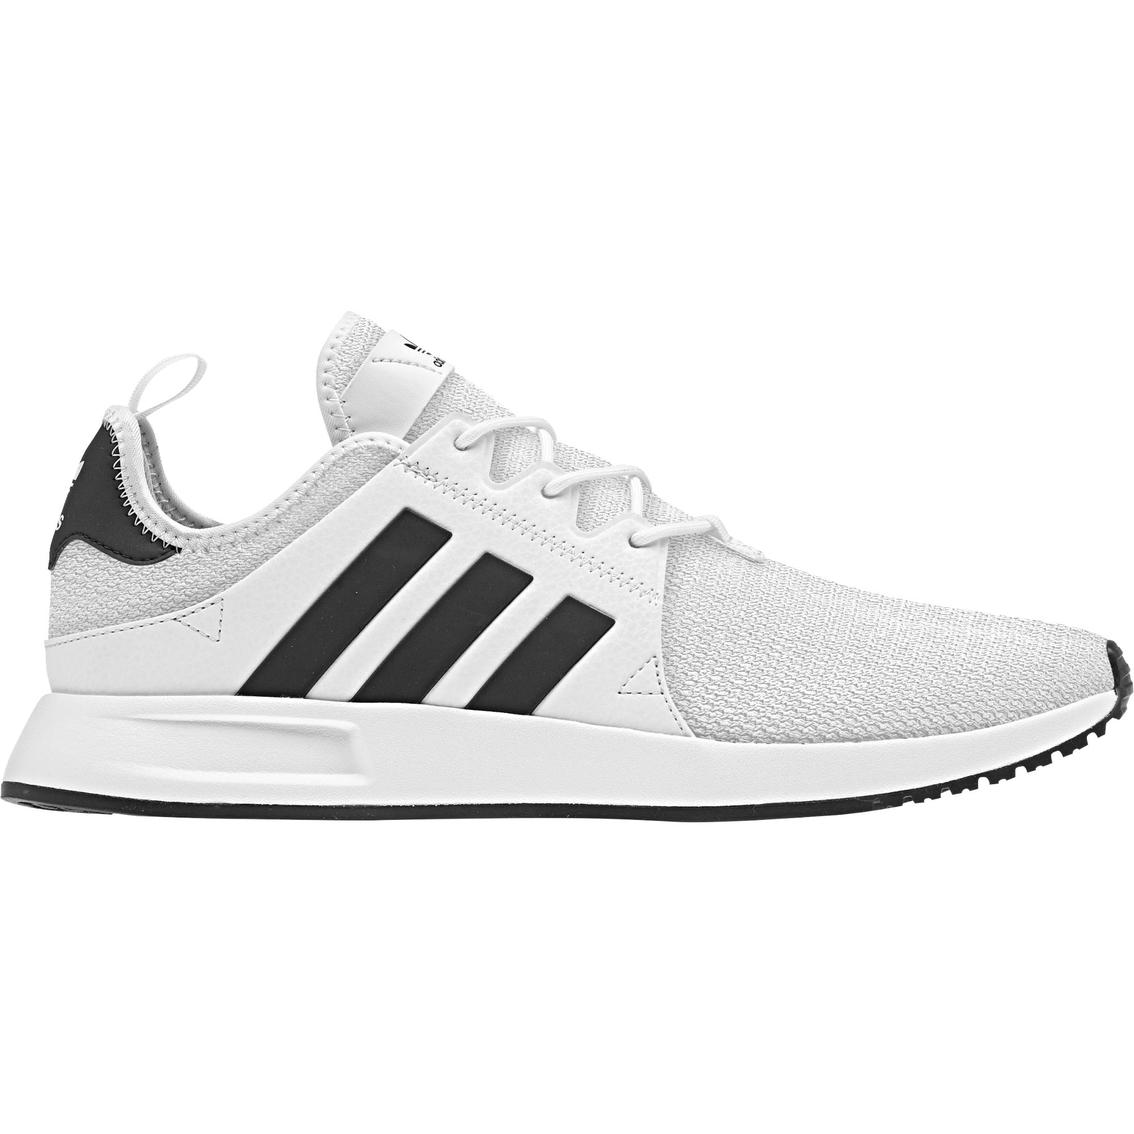 Adidas Men's X Plr Training Shoes